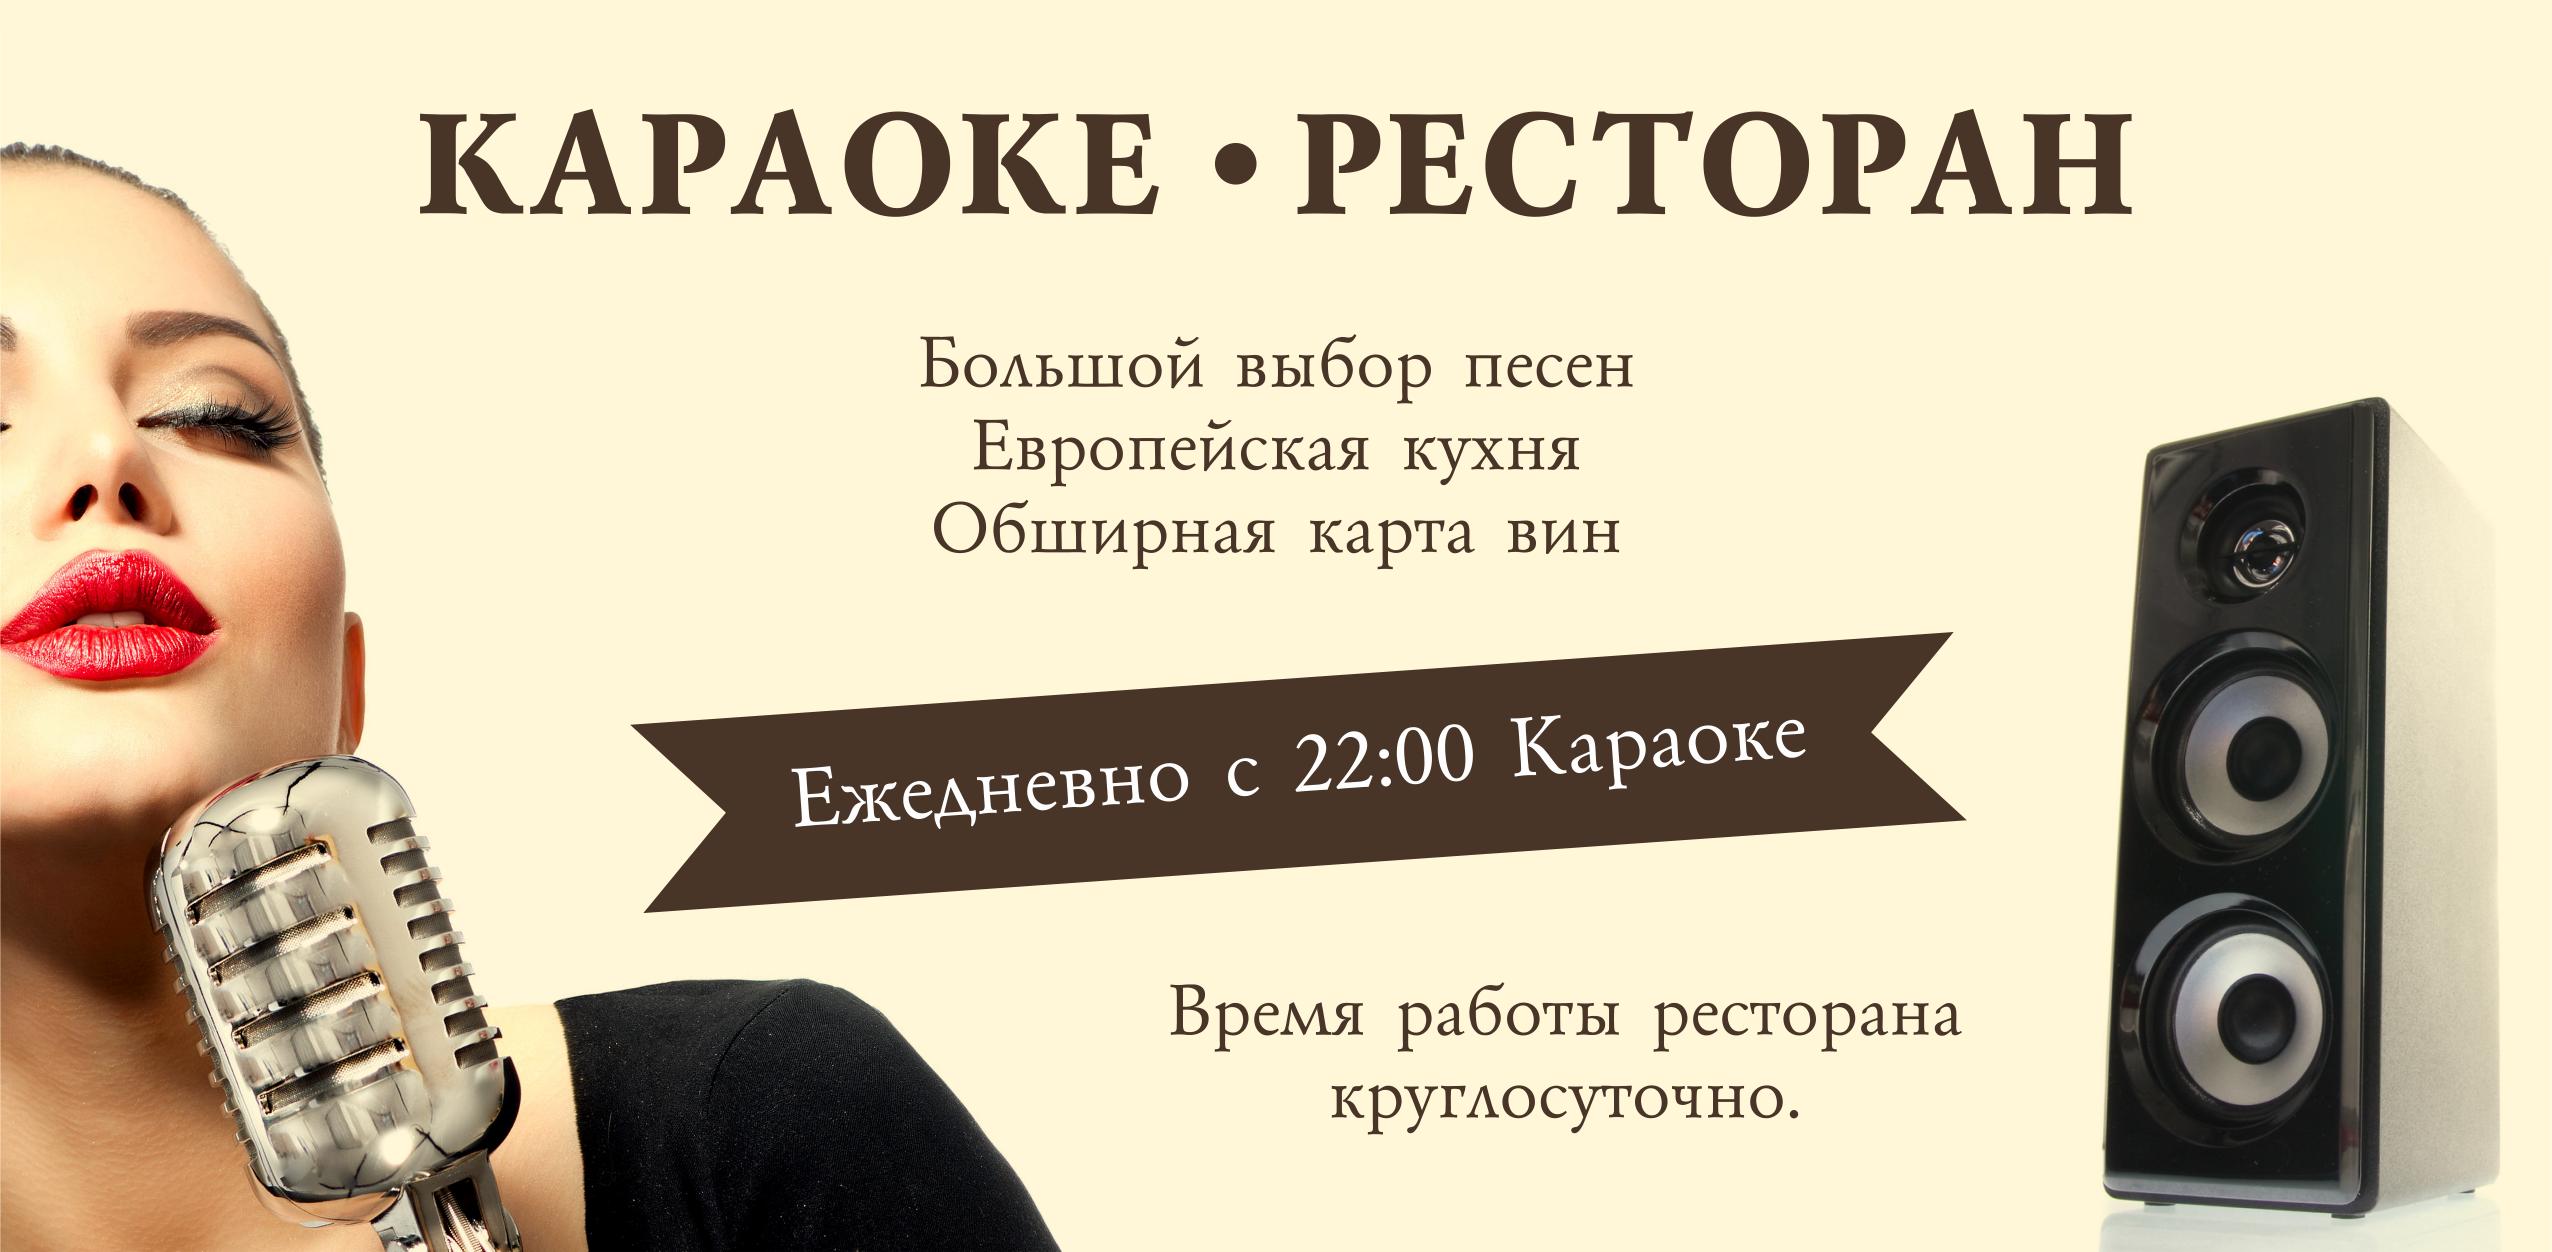 "Флаер для Караоке-ресторана ""Cenador"""